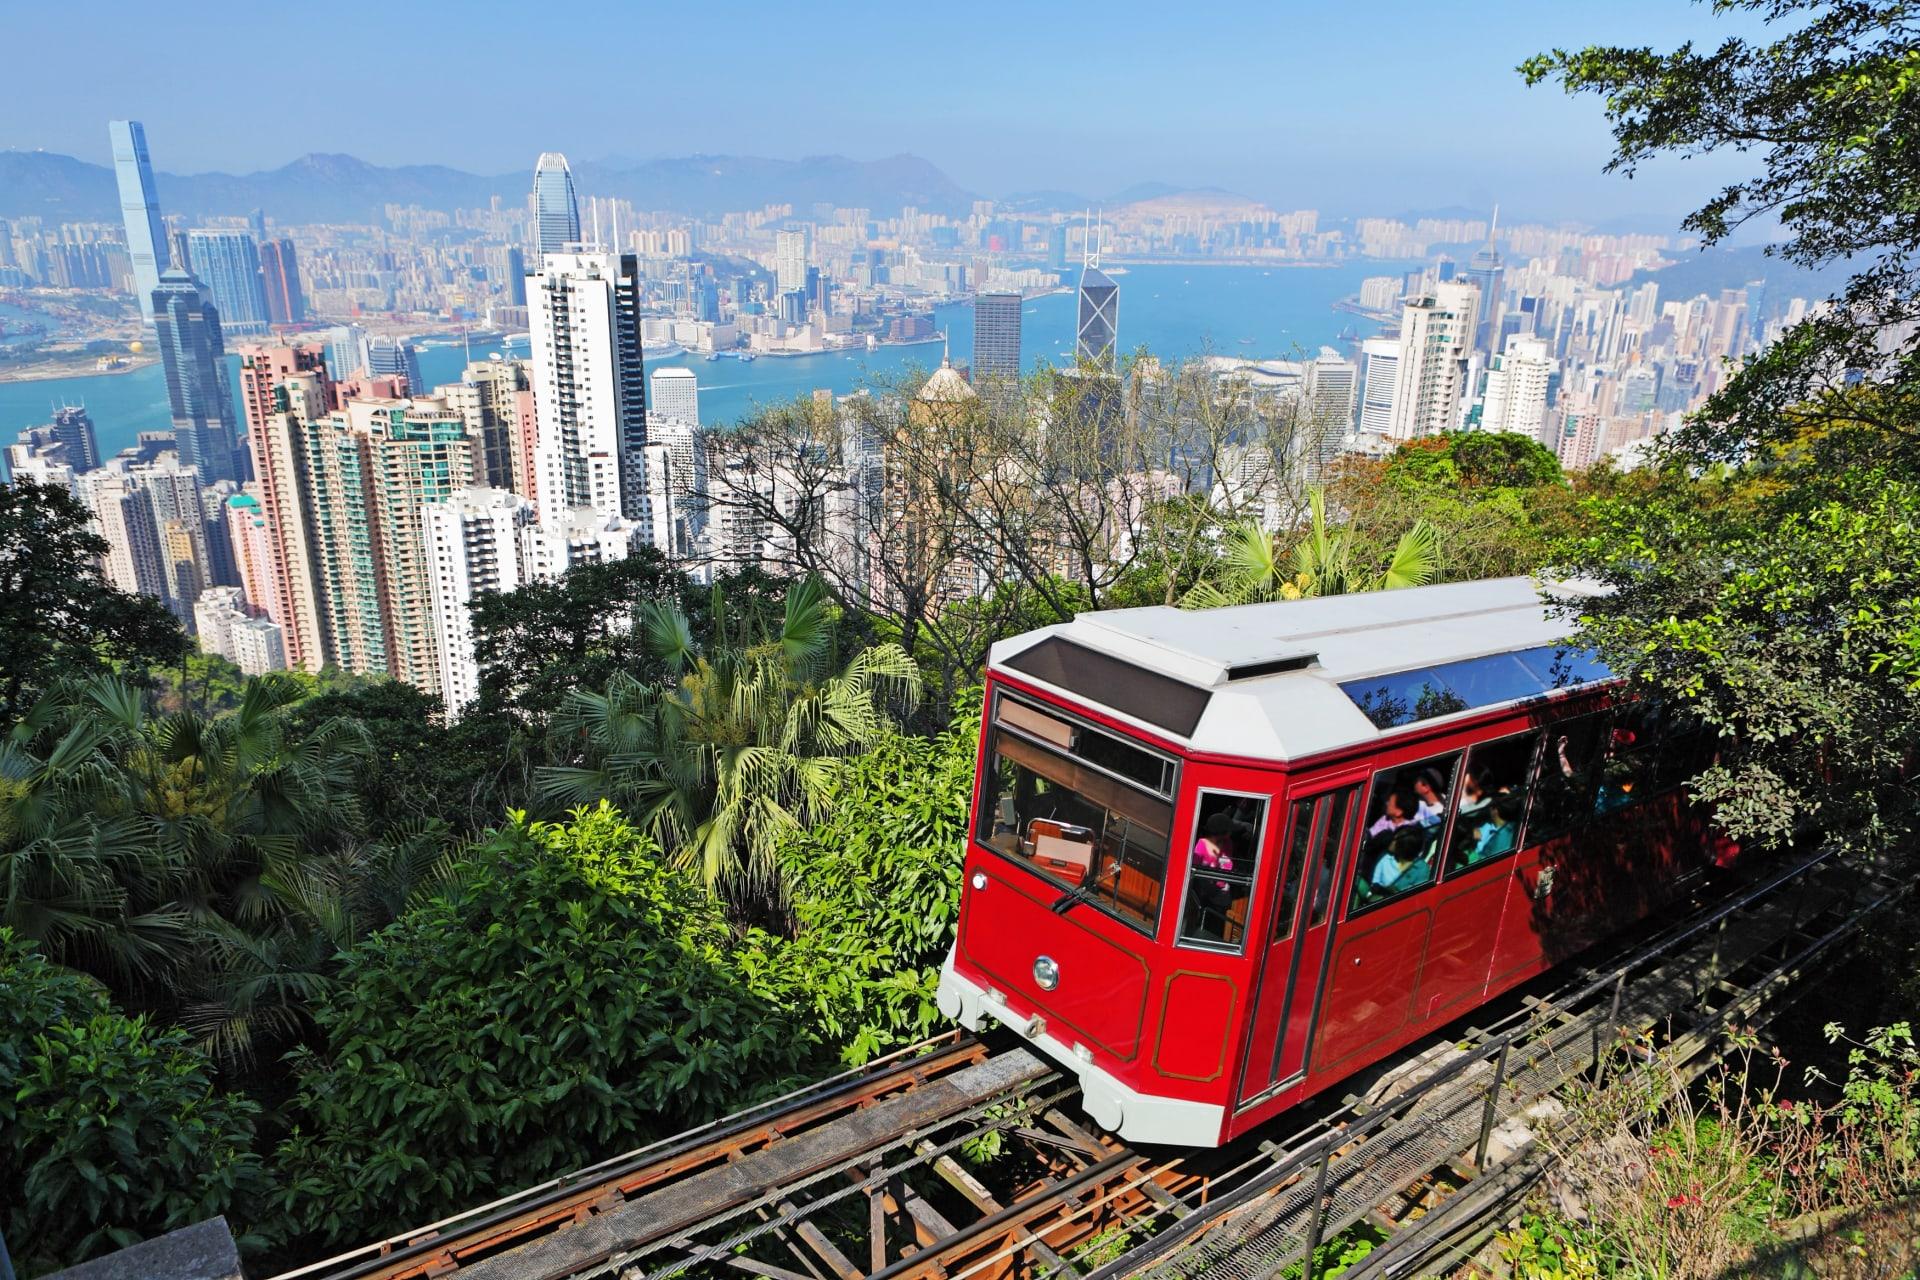 Hong Kong - Taking a Peak Tram to the Victoria Peak